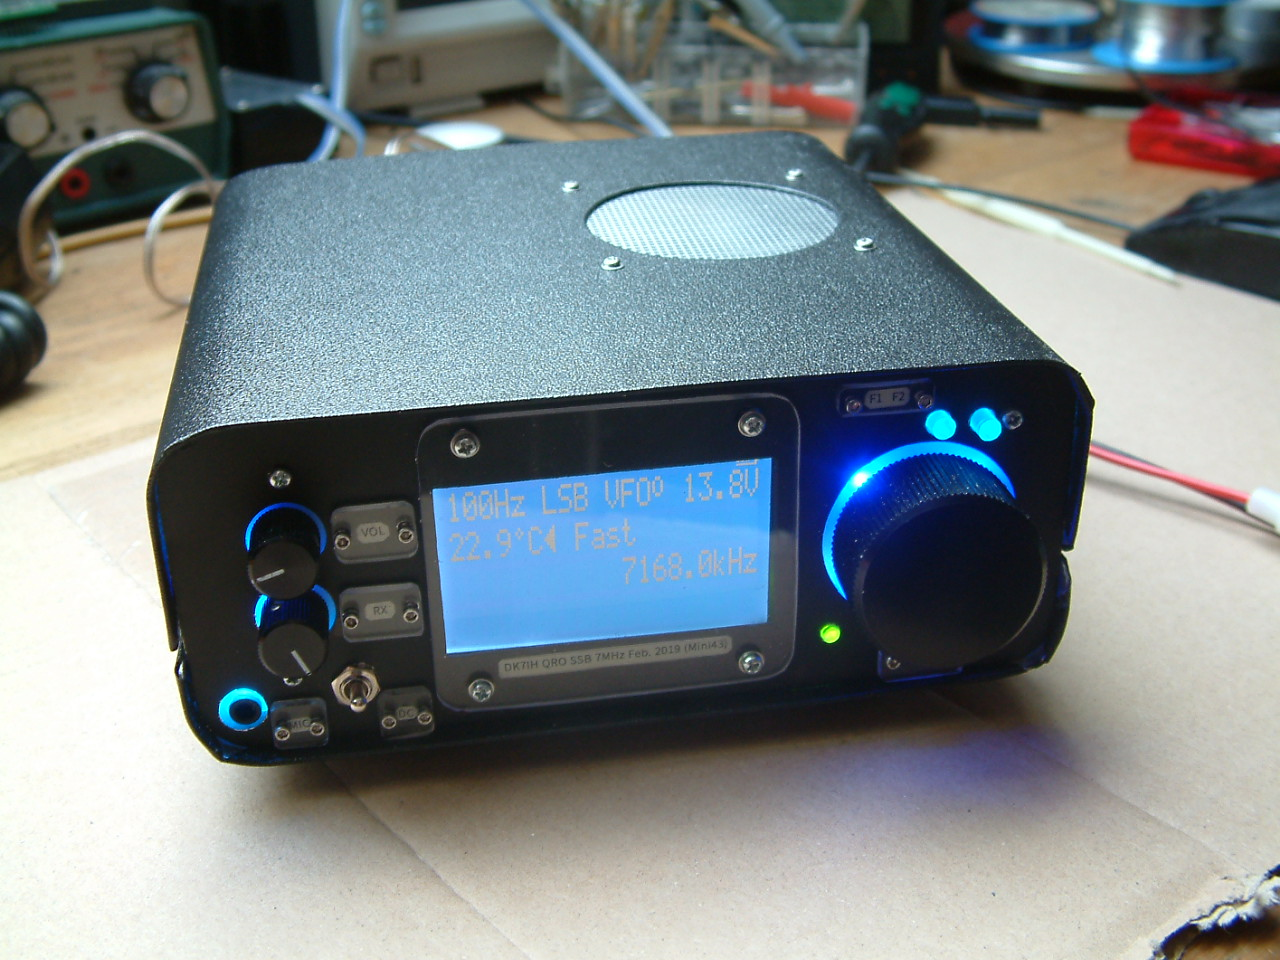 DK7IH QRO SSB transceiver for 7MHz/40m